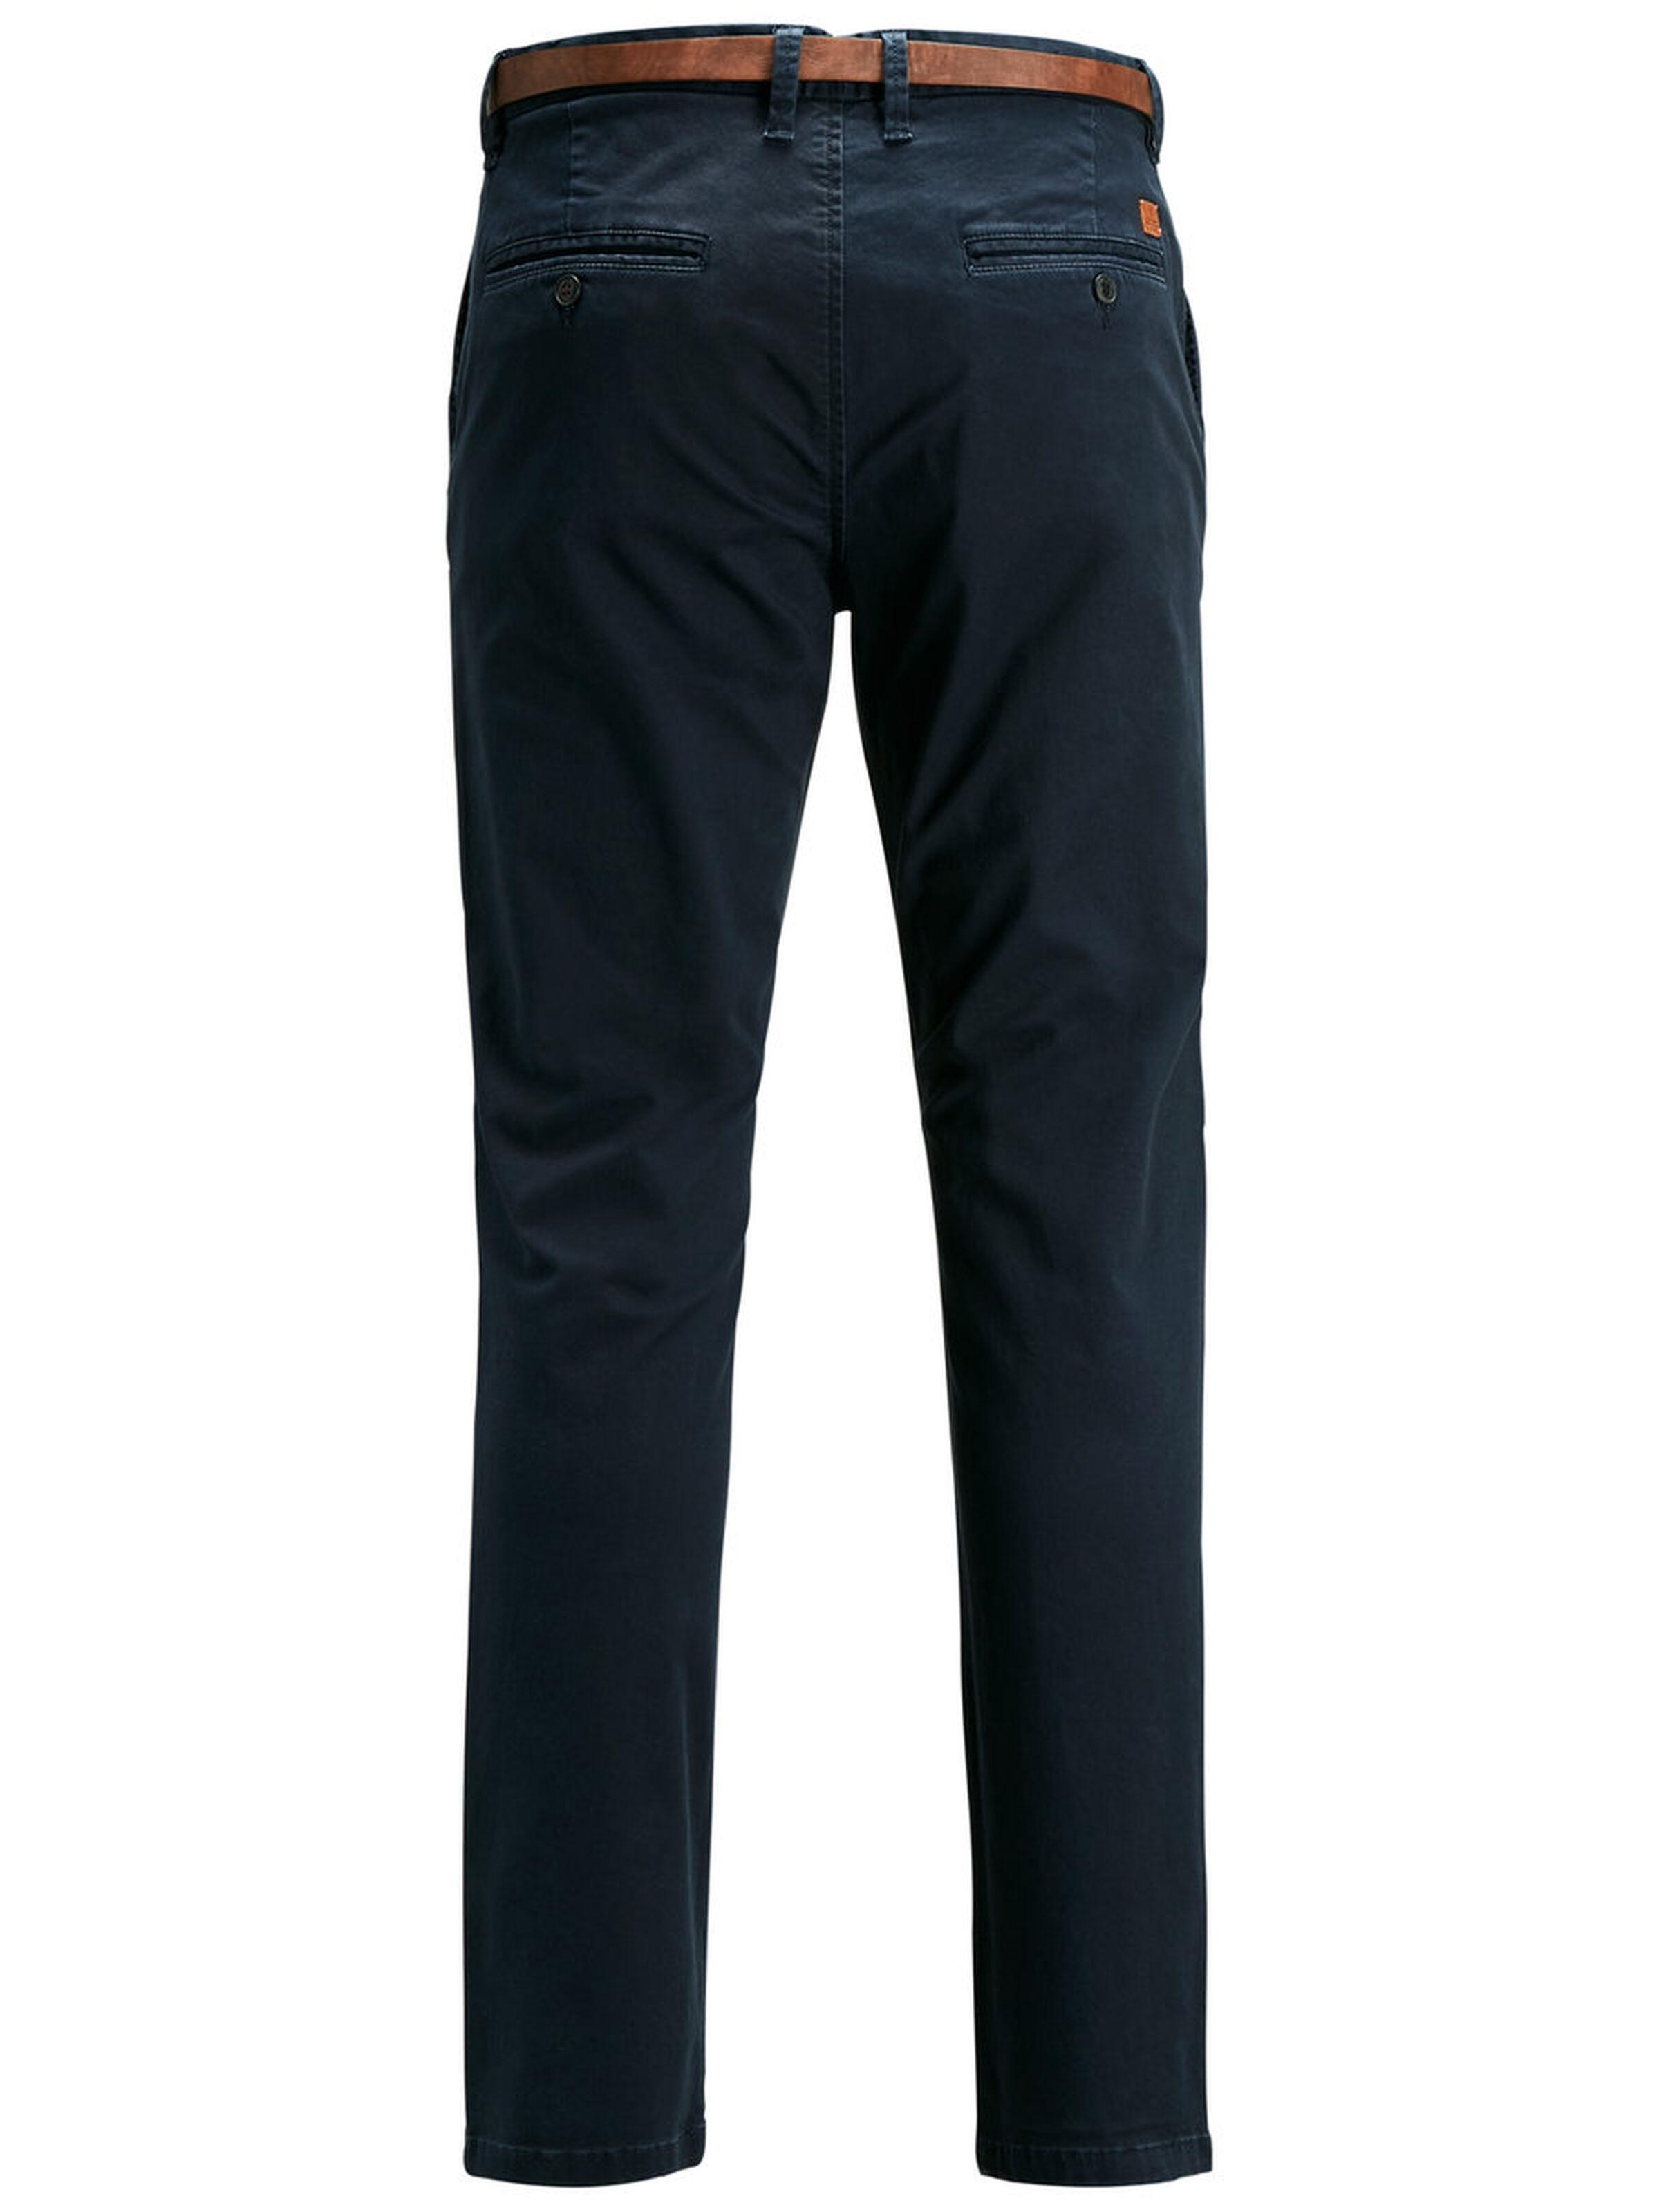 Pantaloni Jack & Jones Casual (3302) photo 0